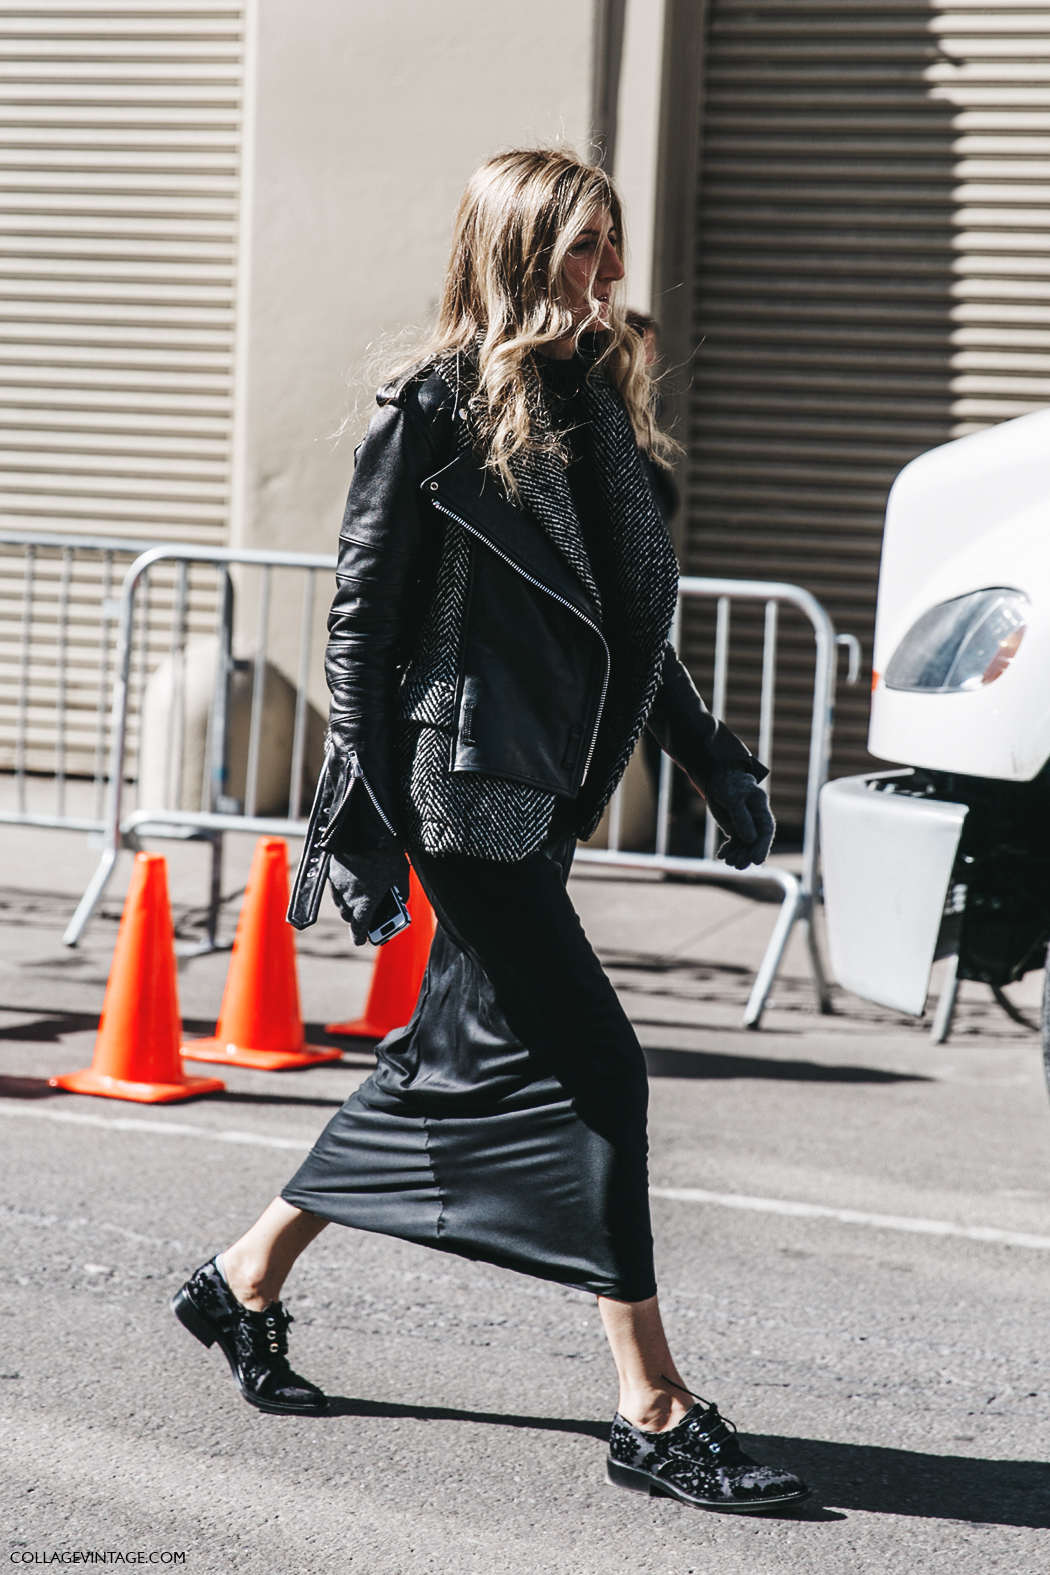 NYFW-New_York_Fashion_Week-Fall_Winter-17-Street_Style-Sarah_Ruston-Pencil_Skirt-Loafers-